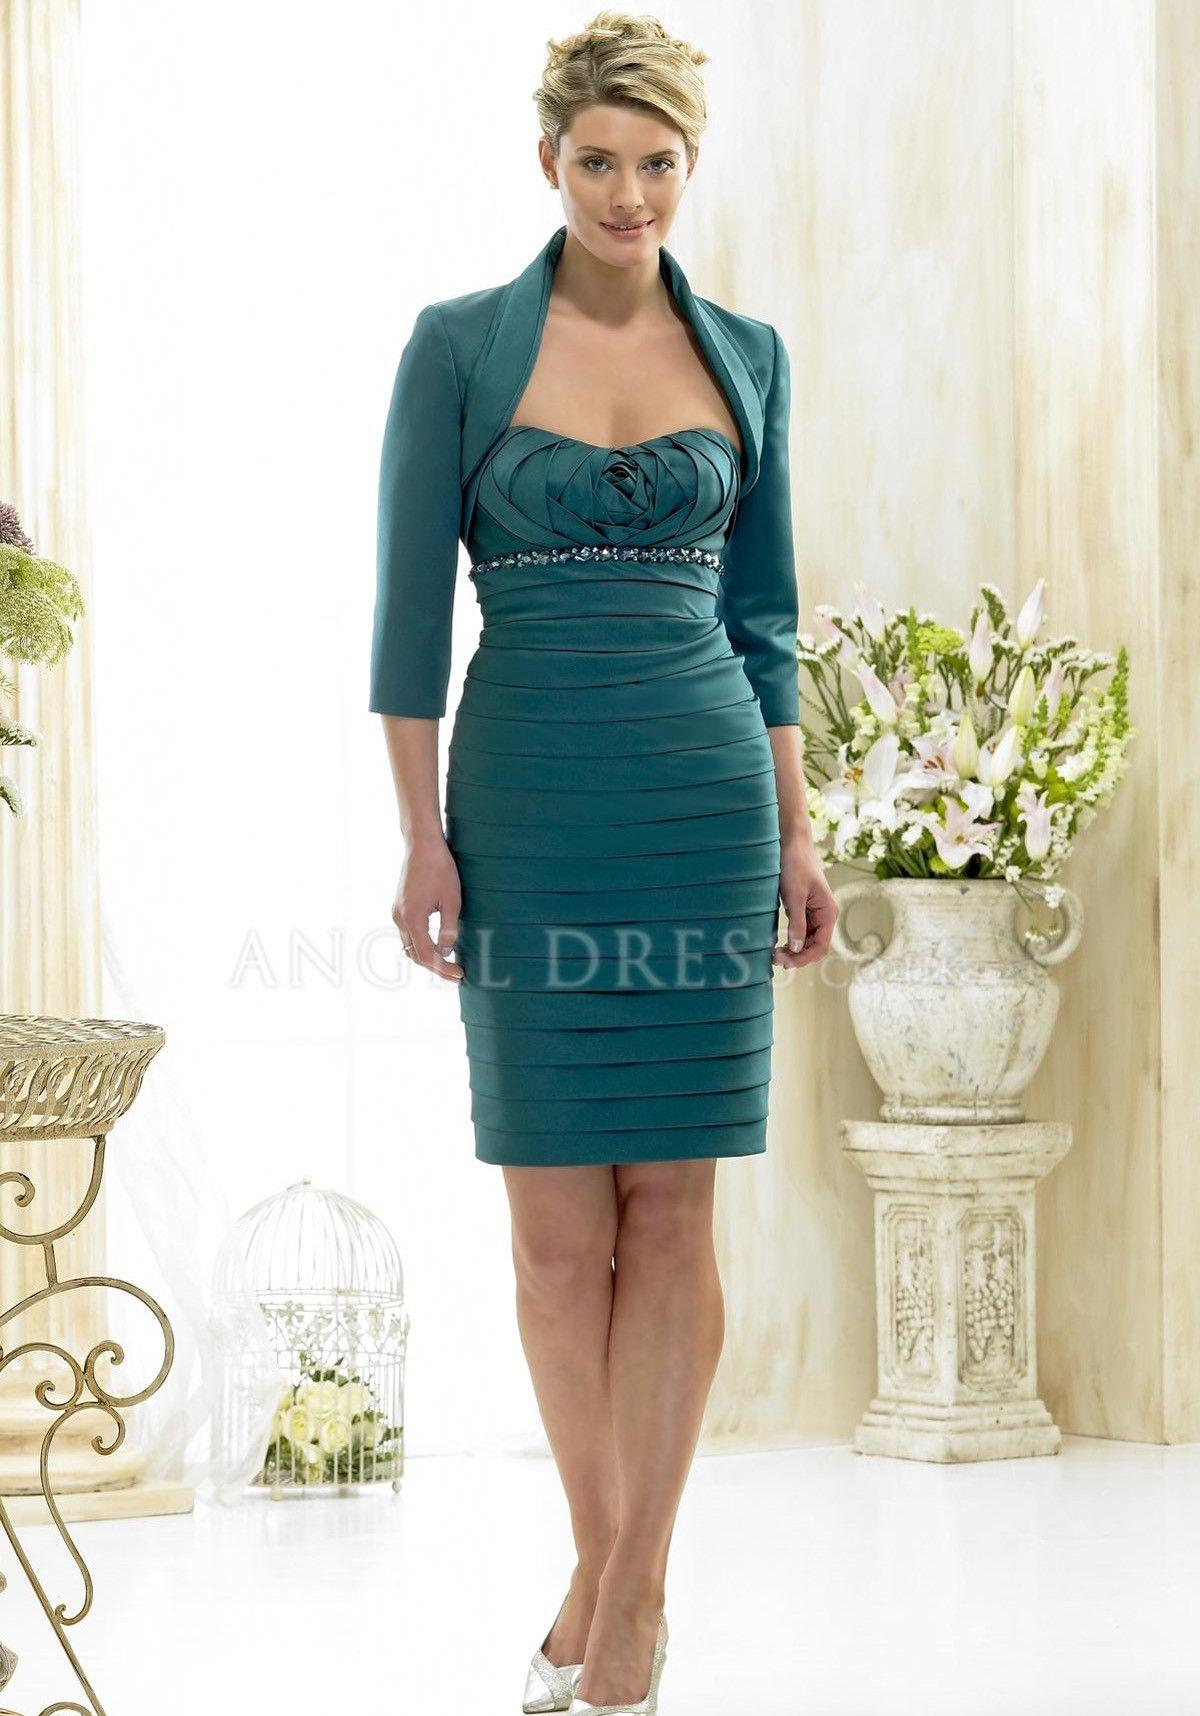 Wedding dresses for mother of the bride  Splendid Sheath Column Empire Waist Zipper Back Satin Mother of the